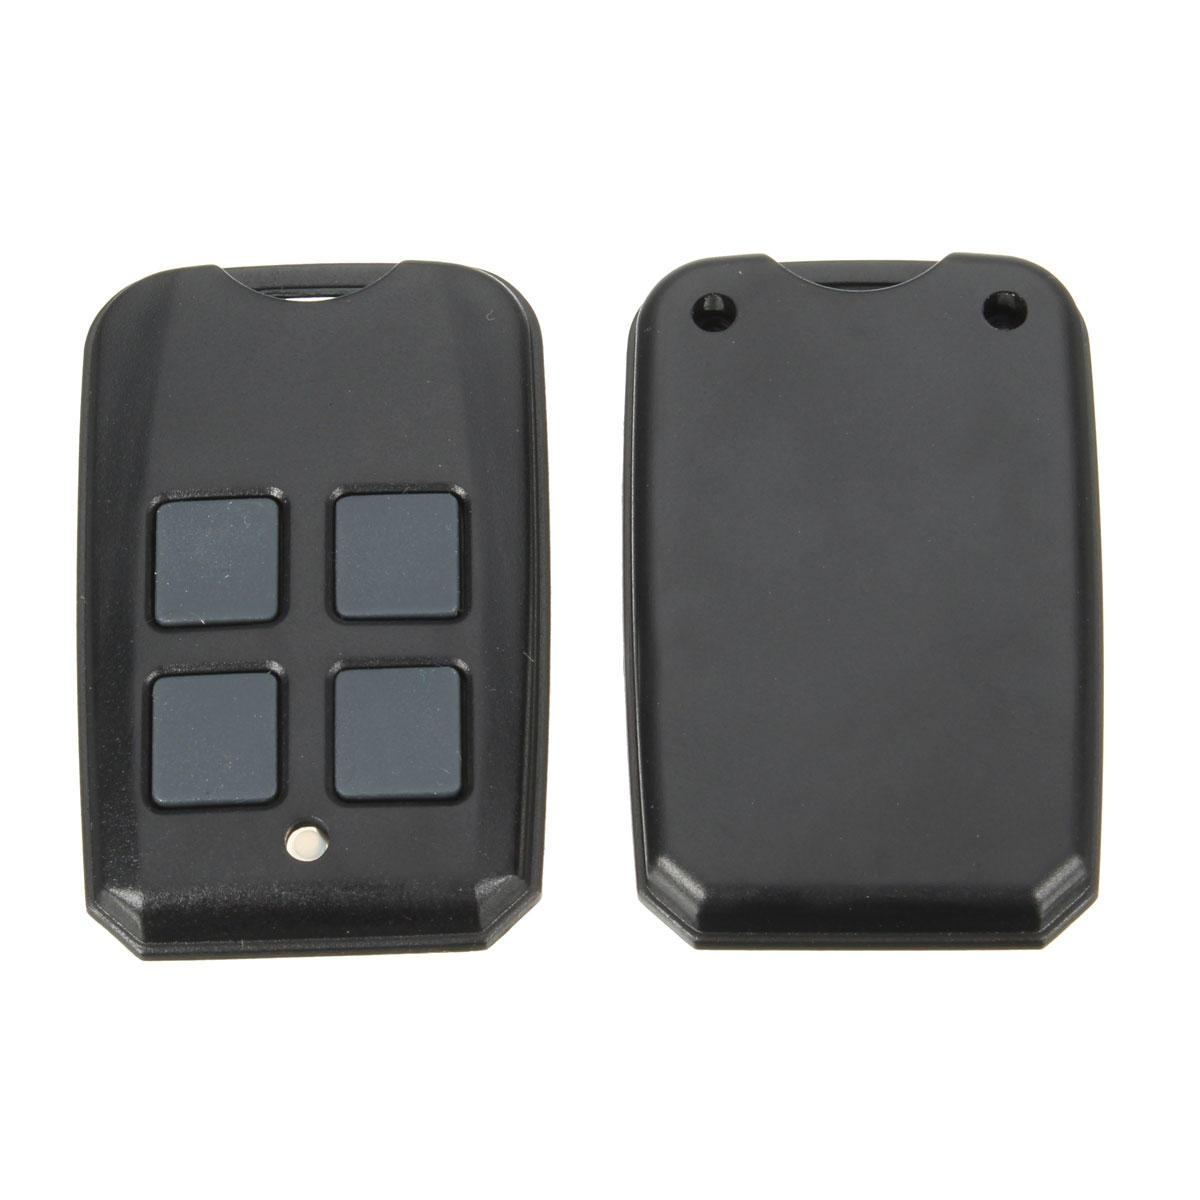 4 Botón 315390MHz Puertas de garaje de control remoto Para G3T BX-GIC GIT OCDT 37218R